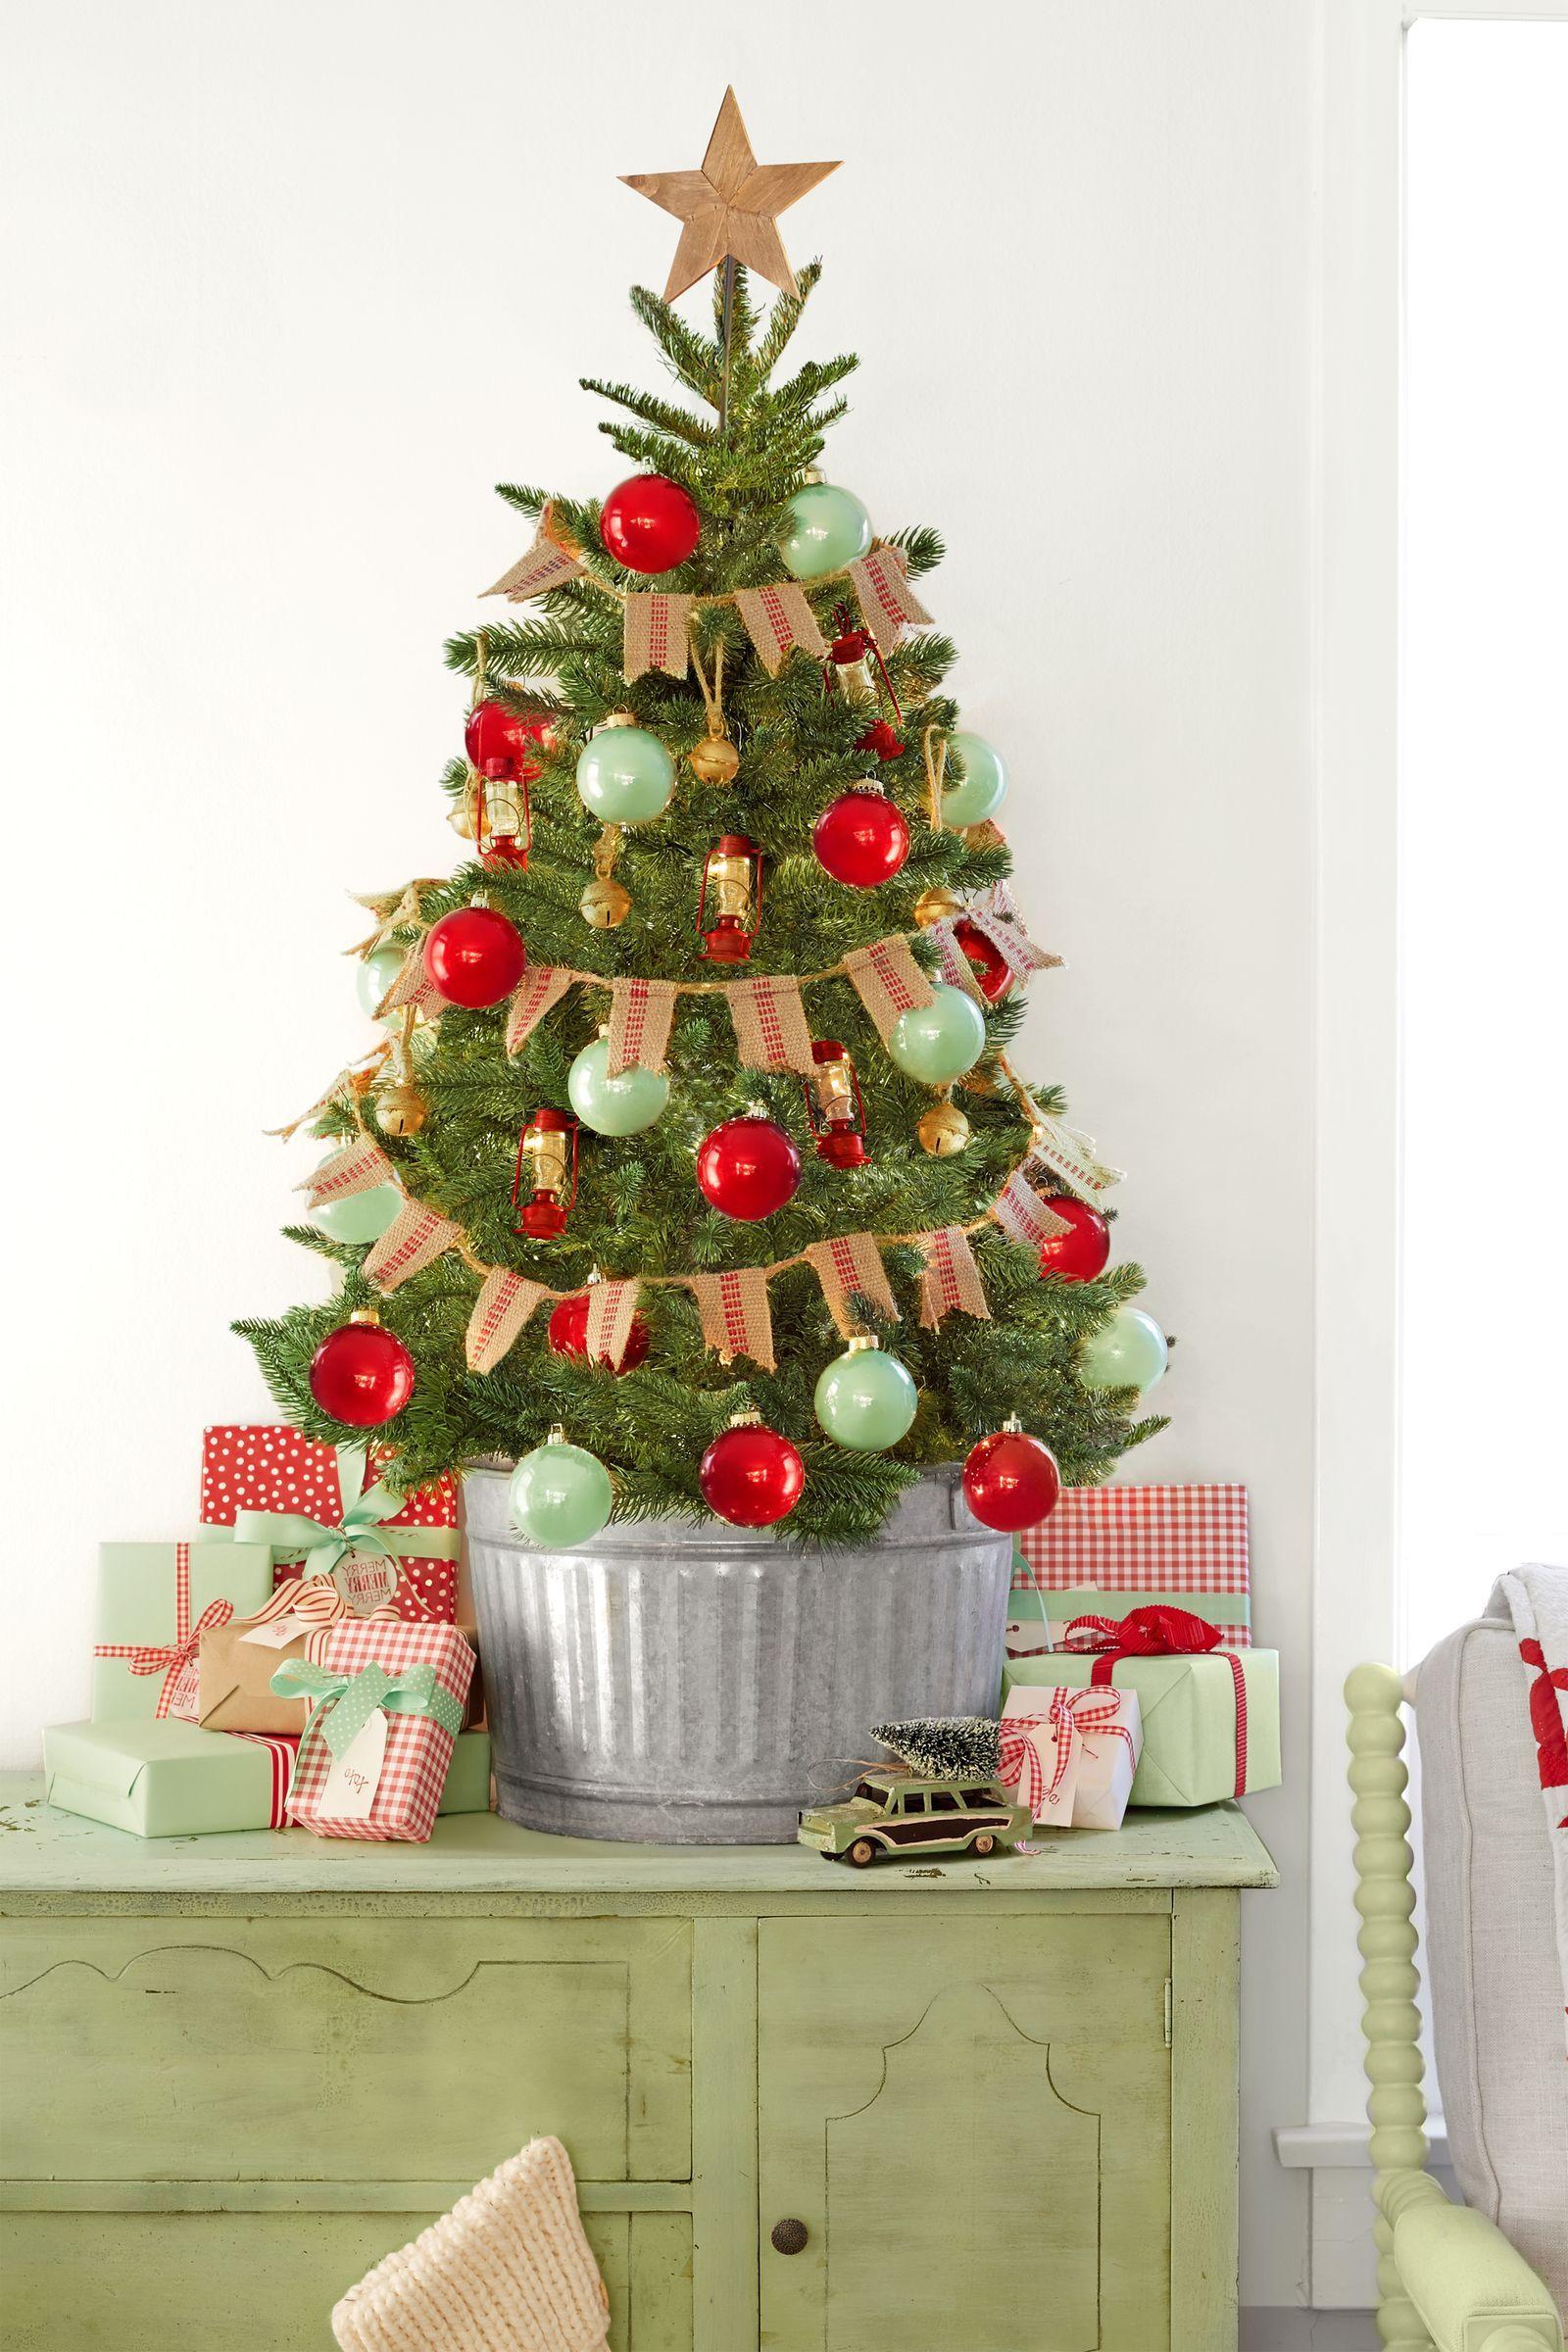 Gift Box Christmas Tree Stand Mini Christmas Tree Decorations